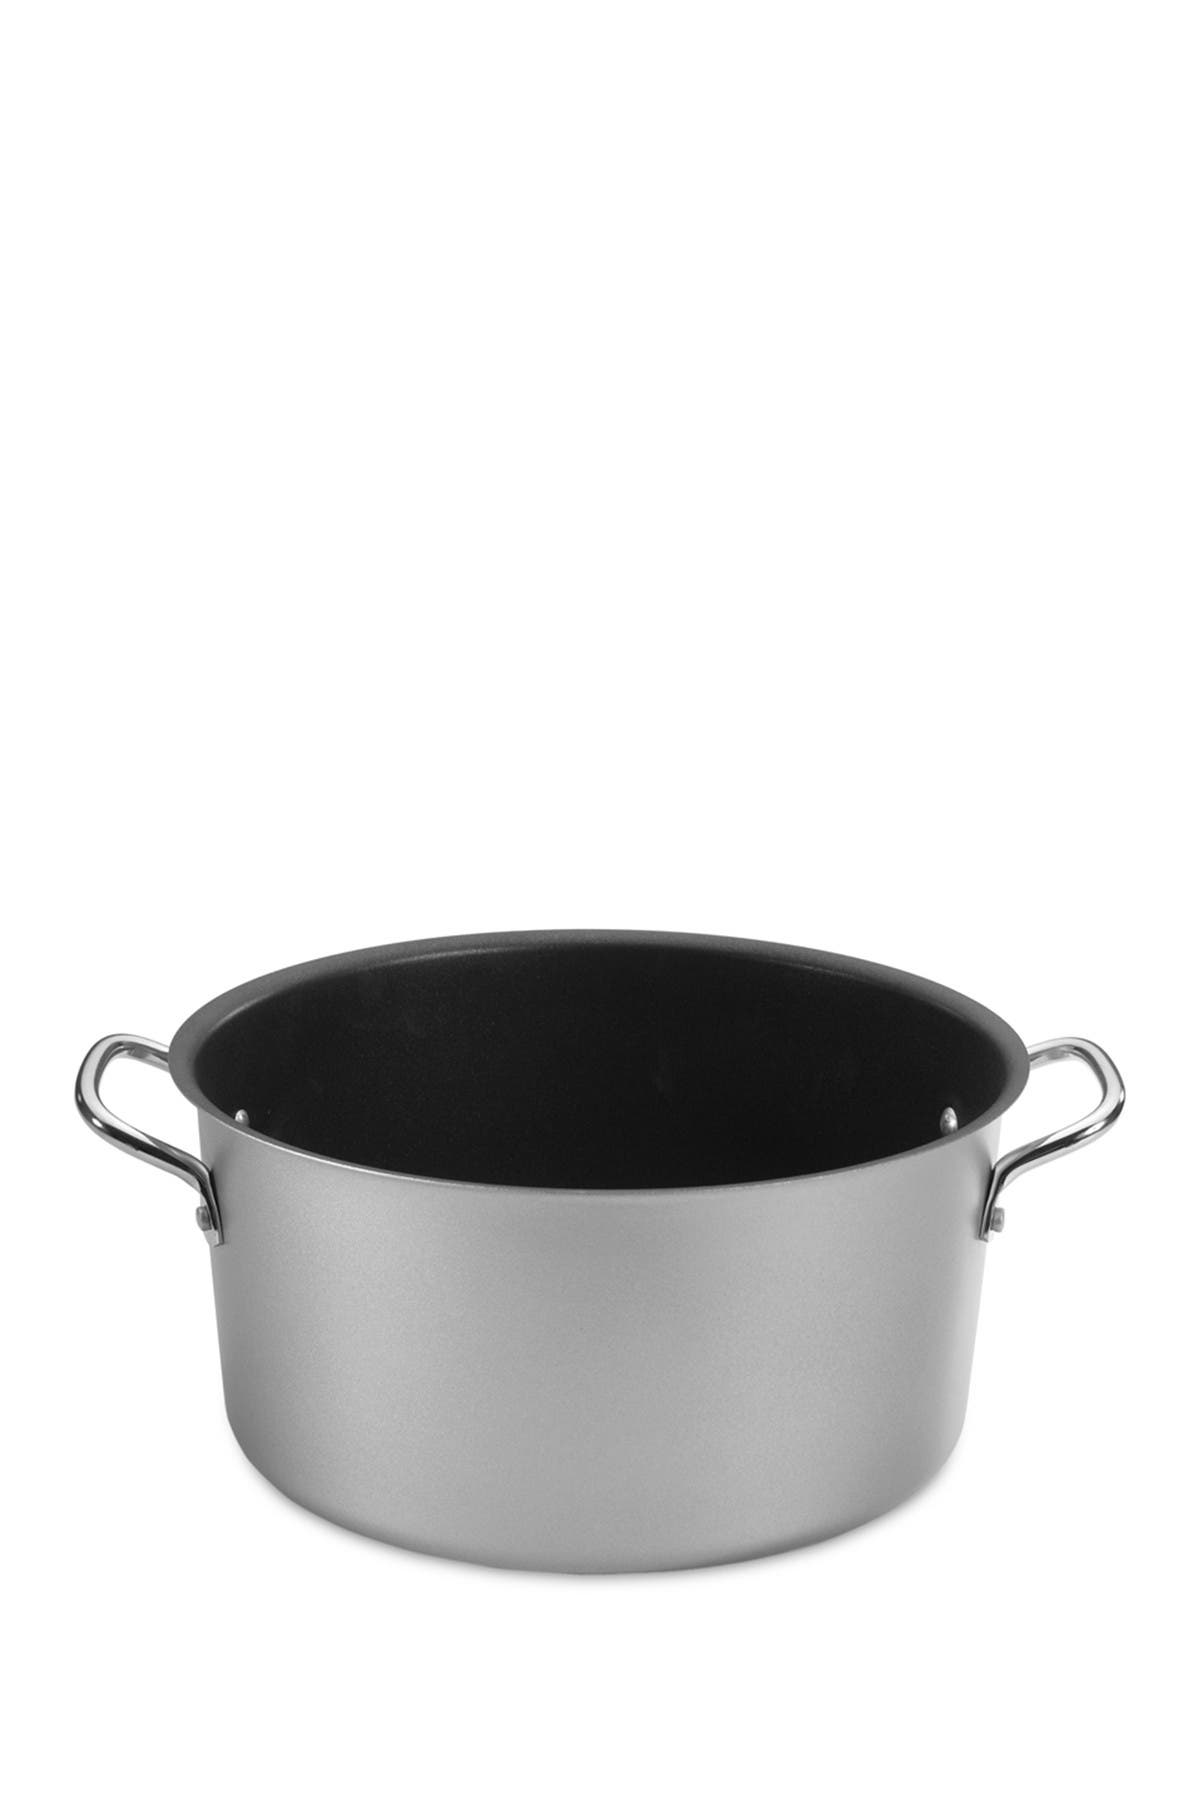 Image of Nordic Ware 6Qt Stockpot